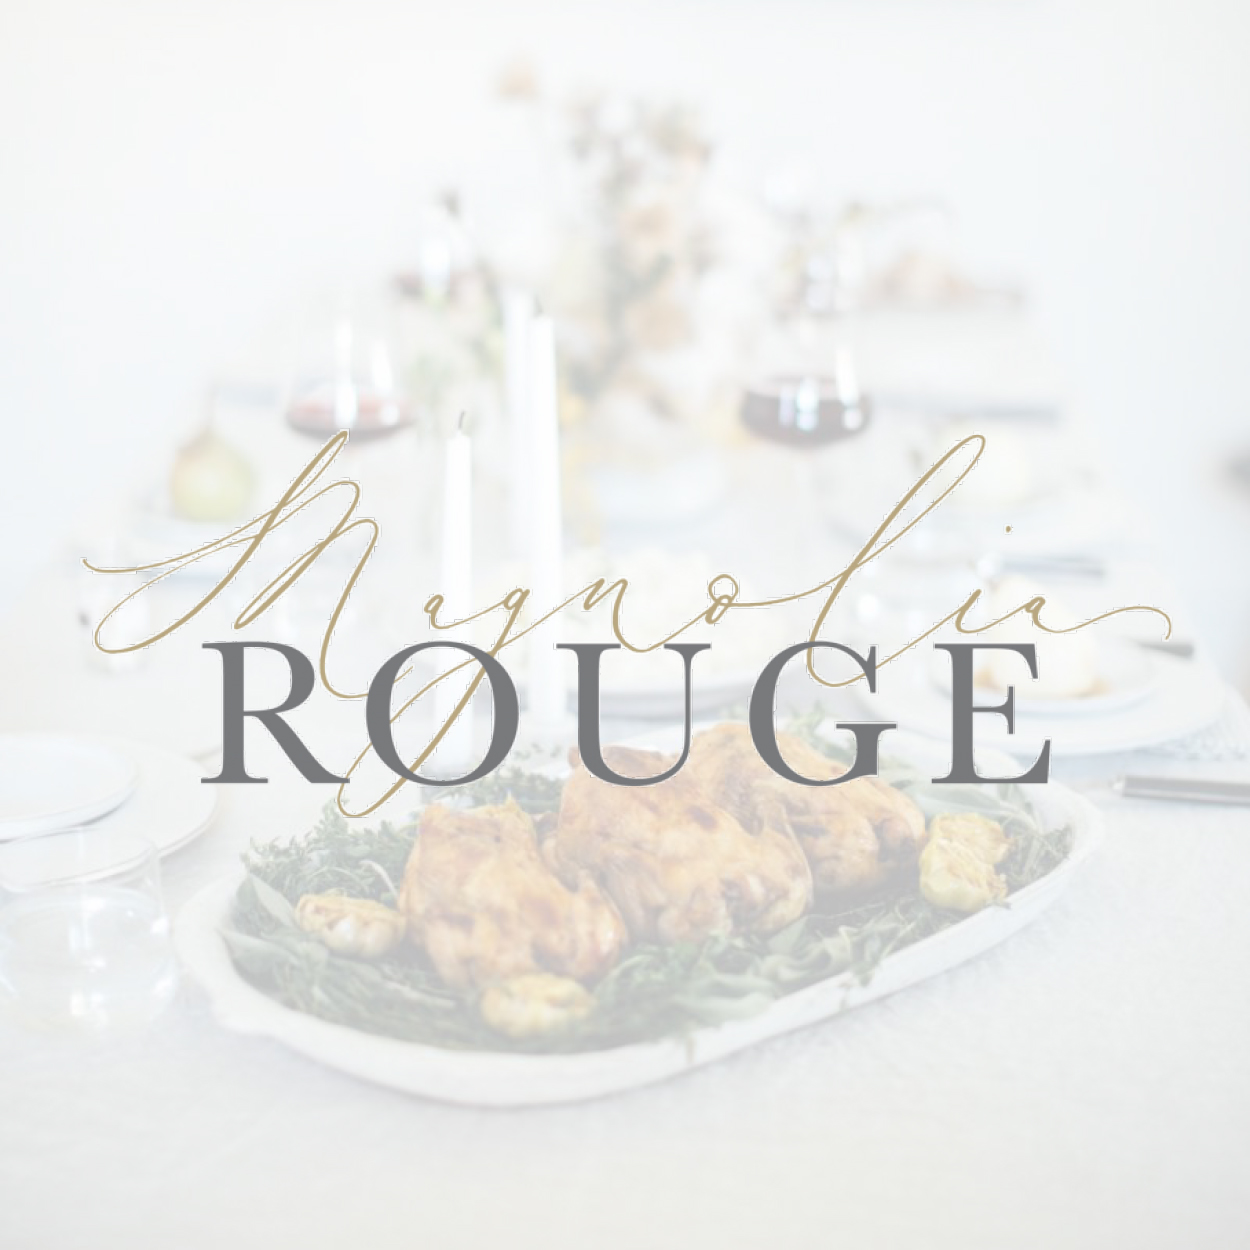 Magnolia Rouge, Cozy Thanksgiving Dinner